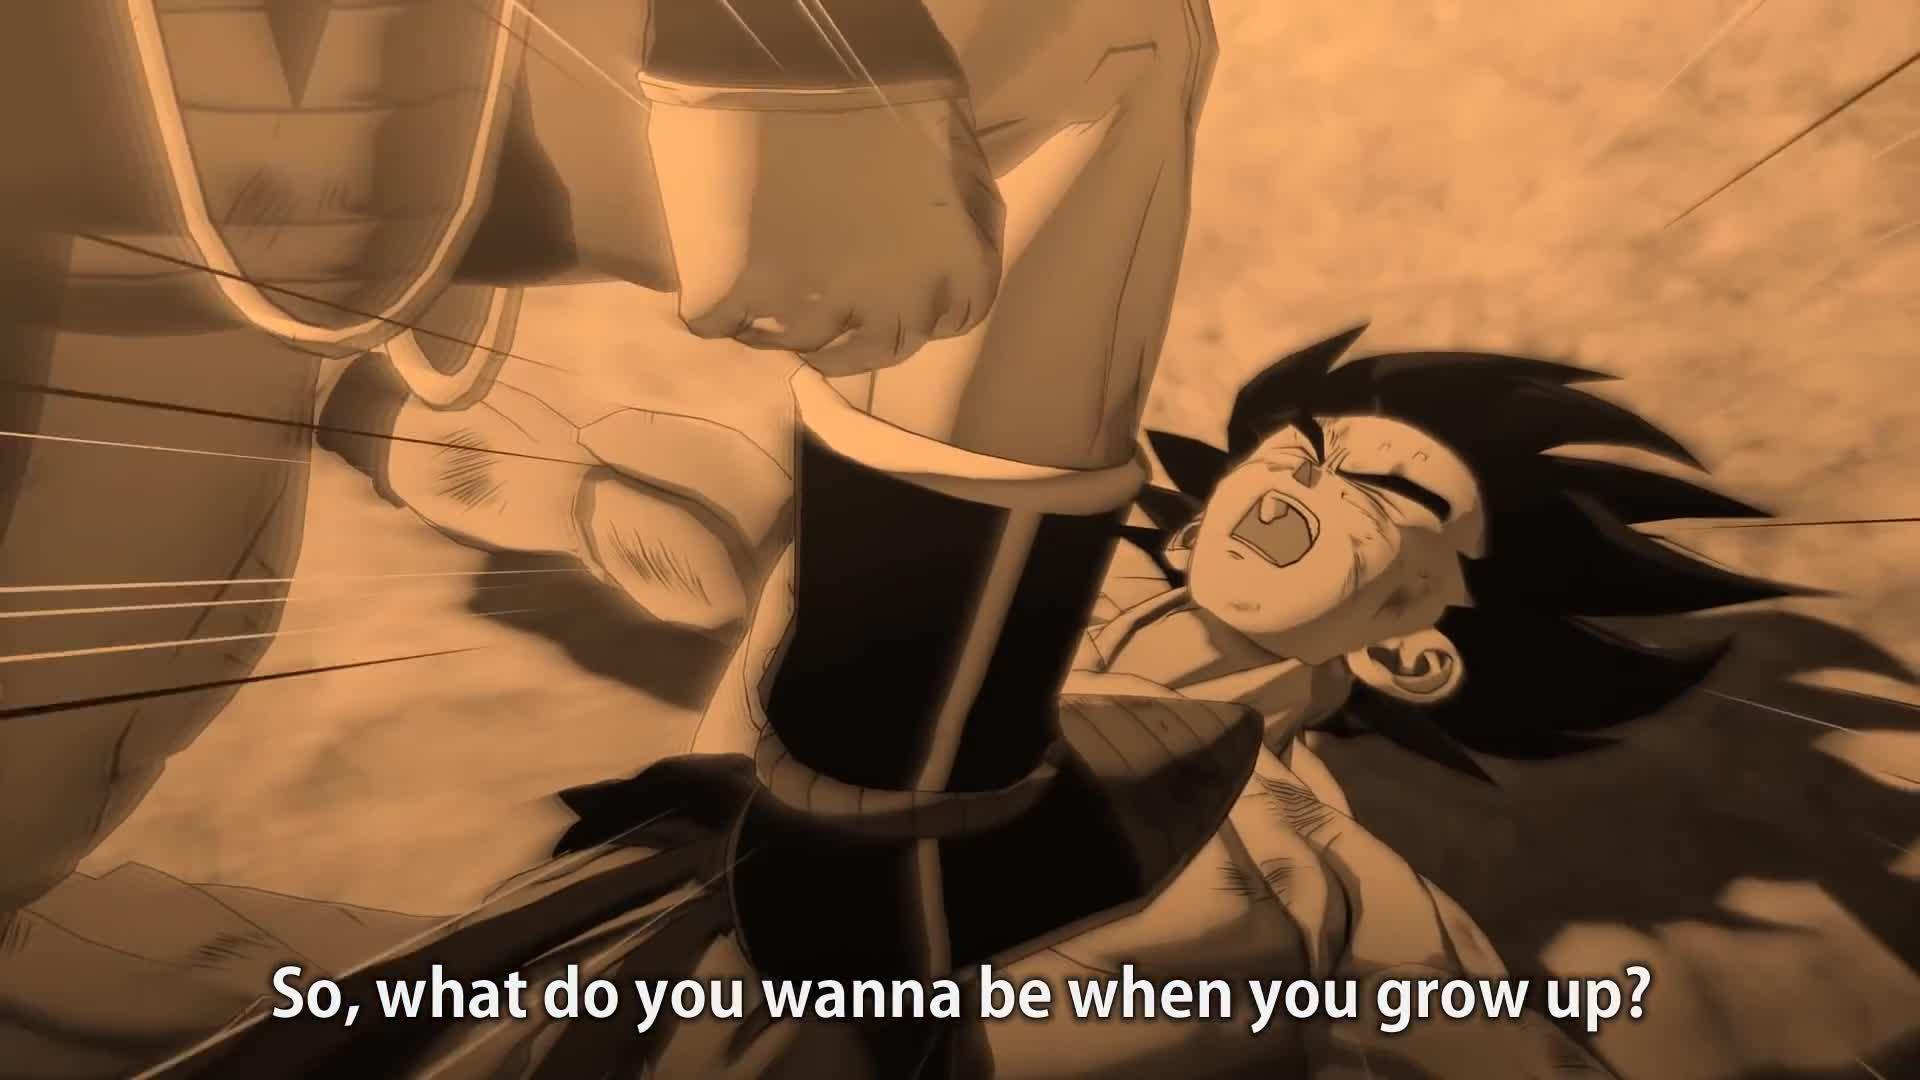 Dragon Ball Z: Kakarot - Cell Saga Trailer [HD] screen capture